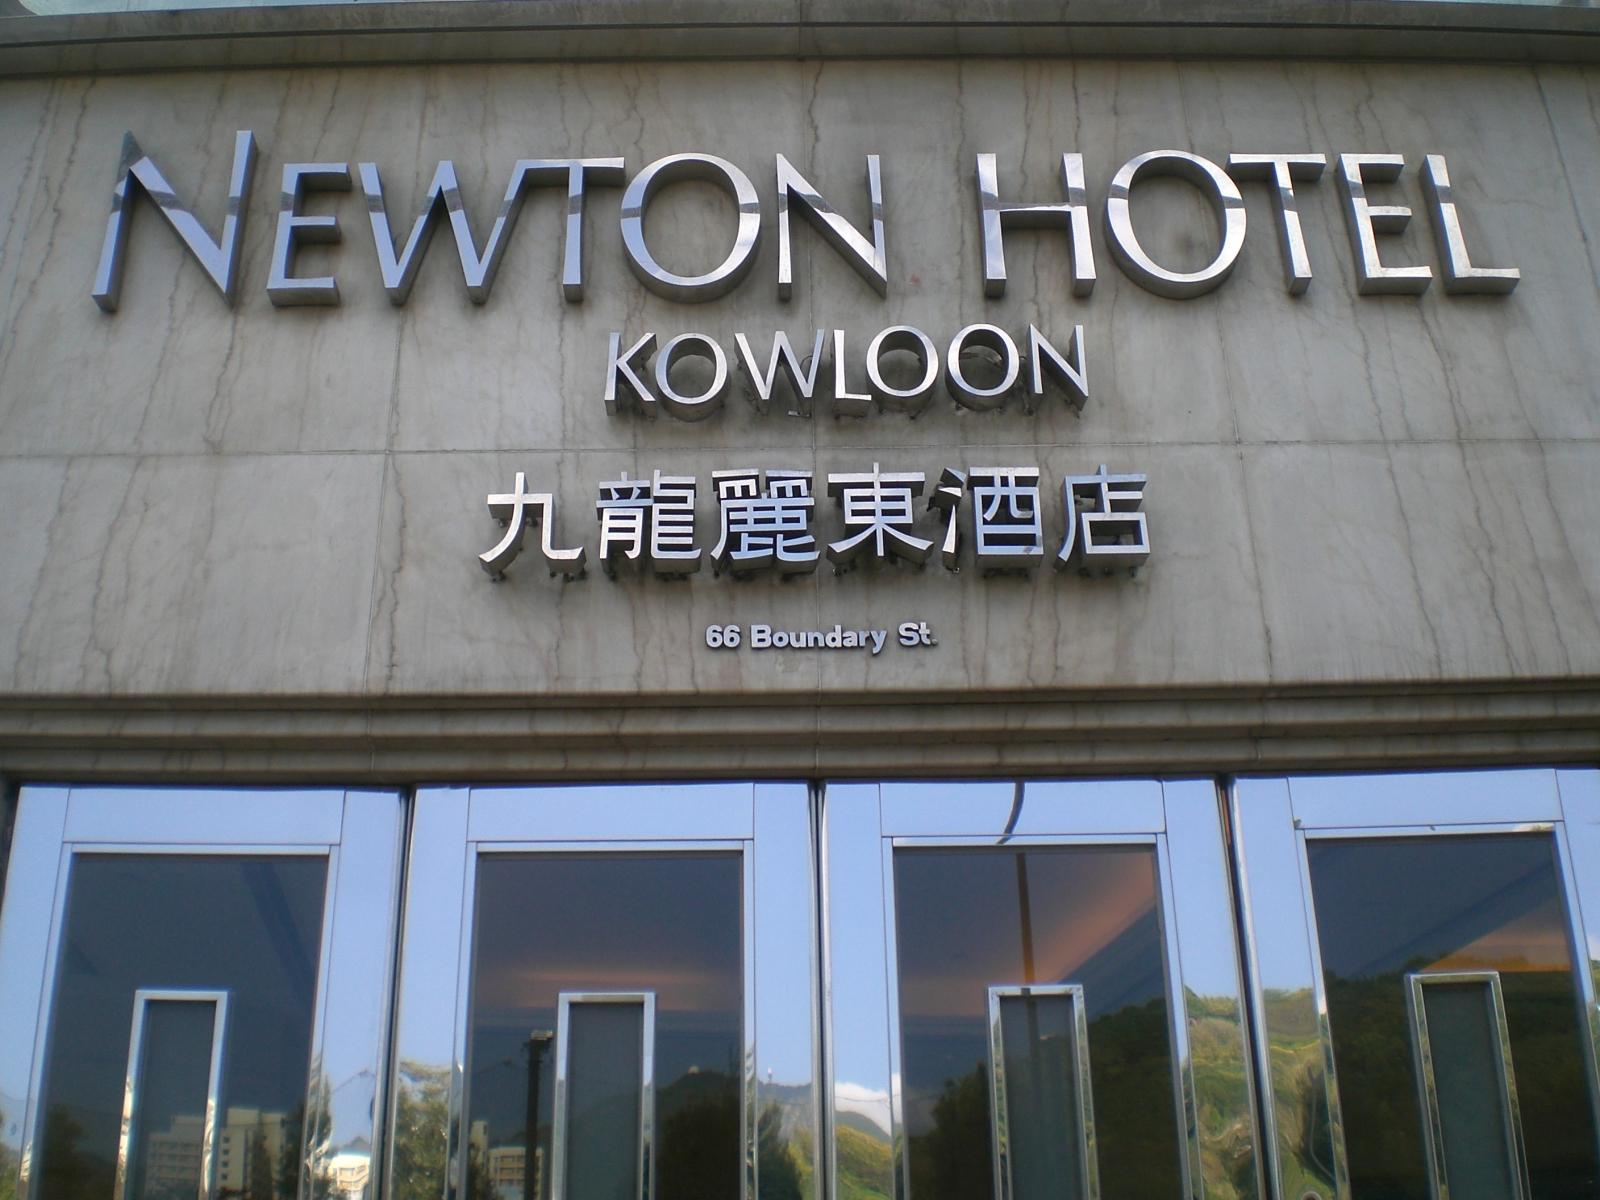 File Hk Boundary Street 66 Newton Hotel Kowloon Jpg